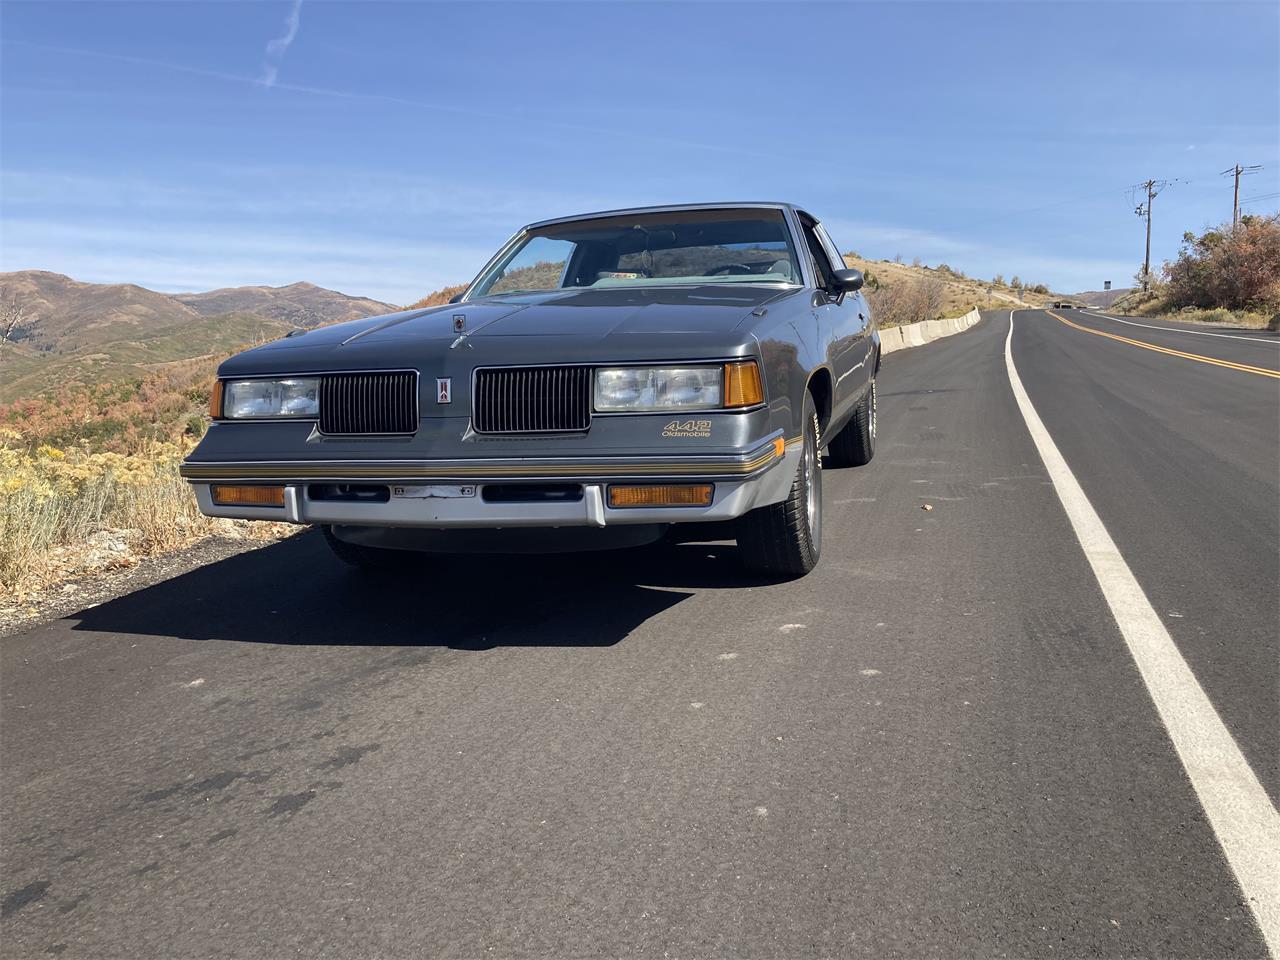 1987 Oldsmobile Cutlass (CC-1412361) for sale in Salt lake city, Utah